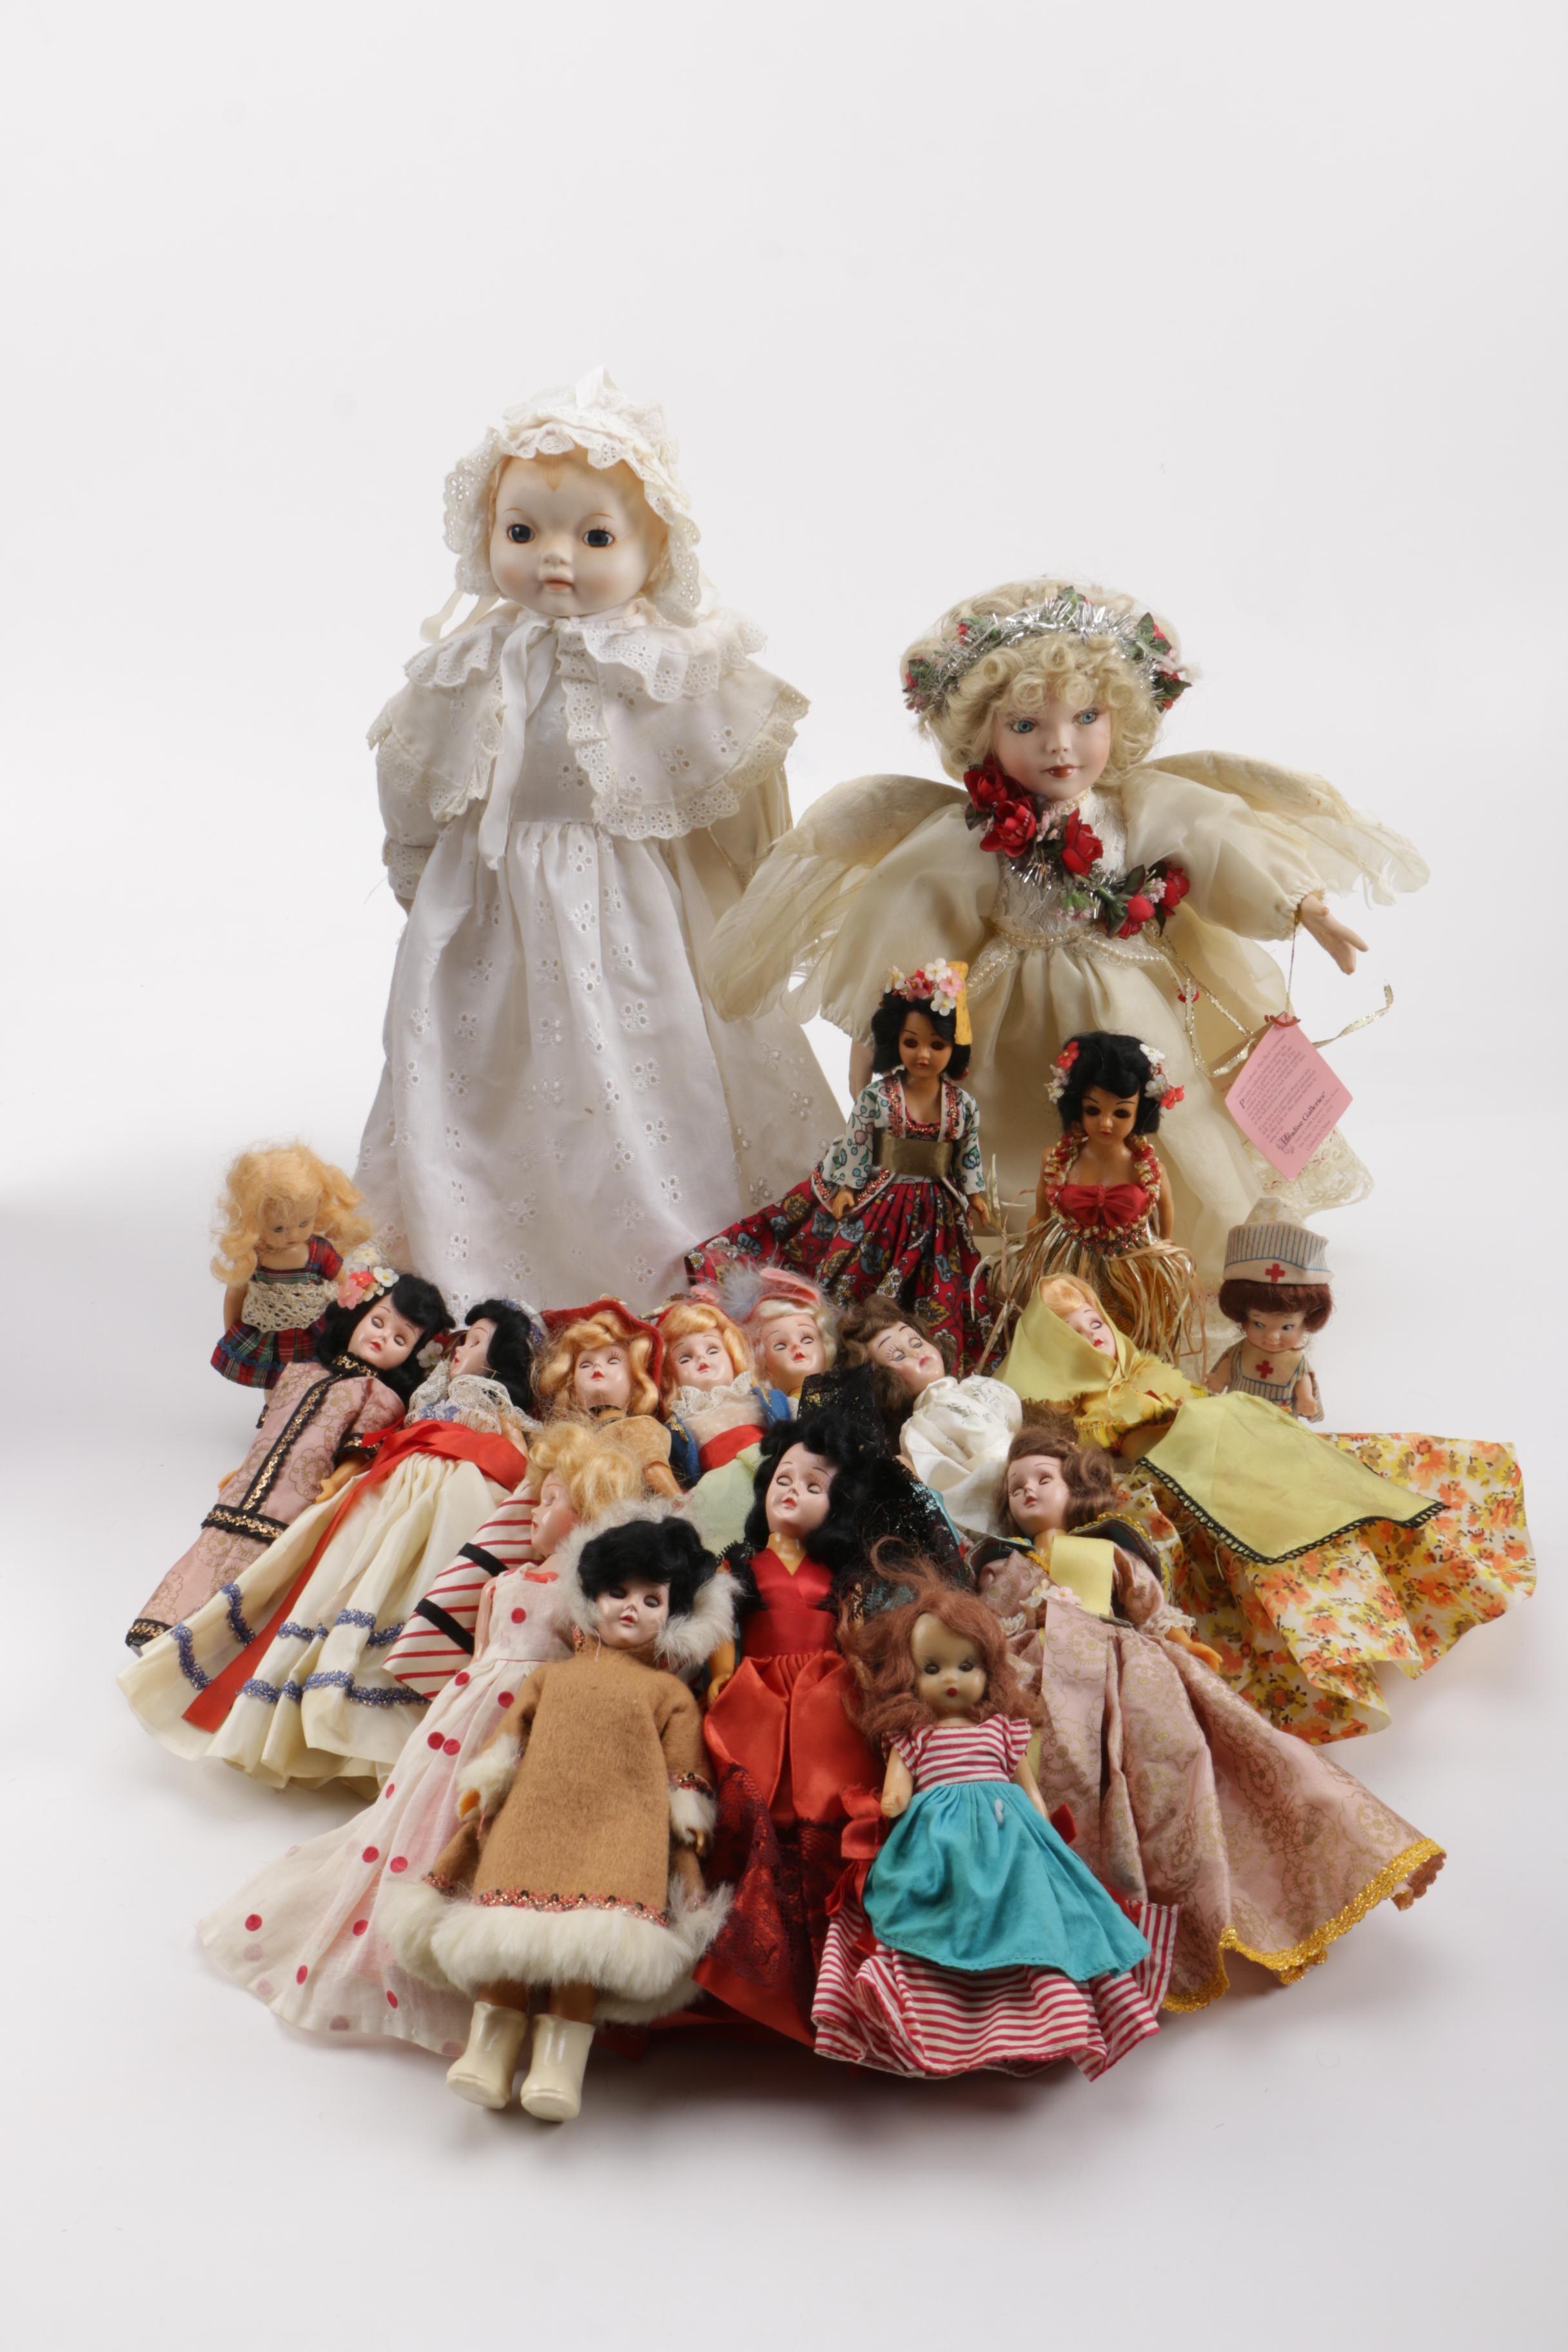 Porcelain and Vinyl Dolls